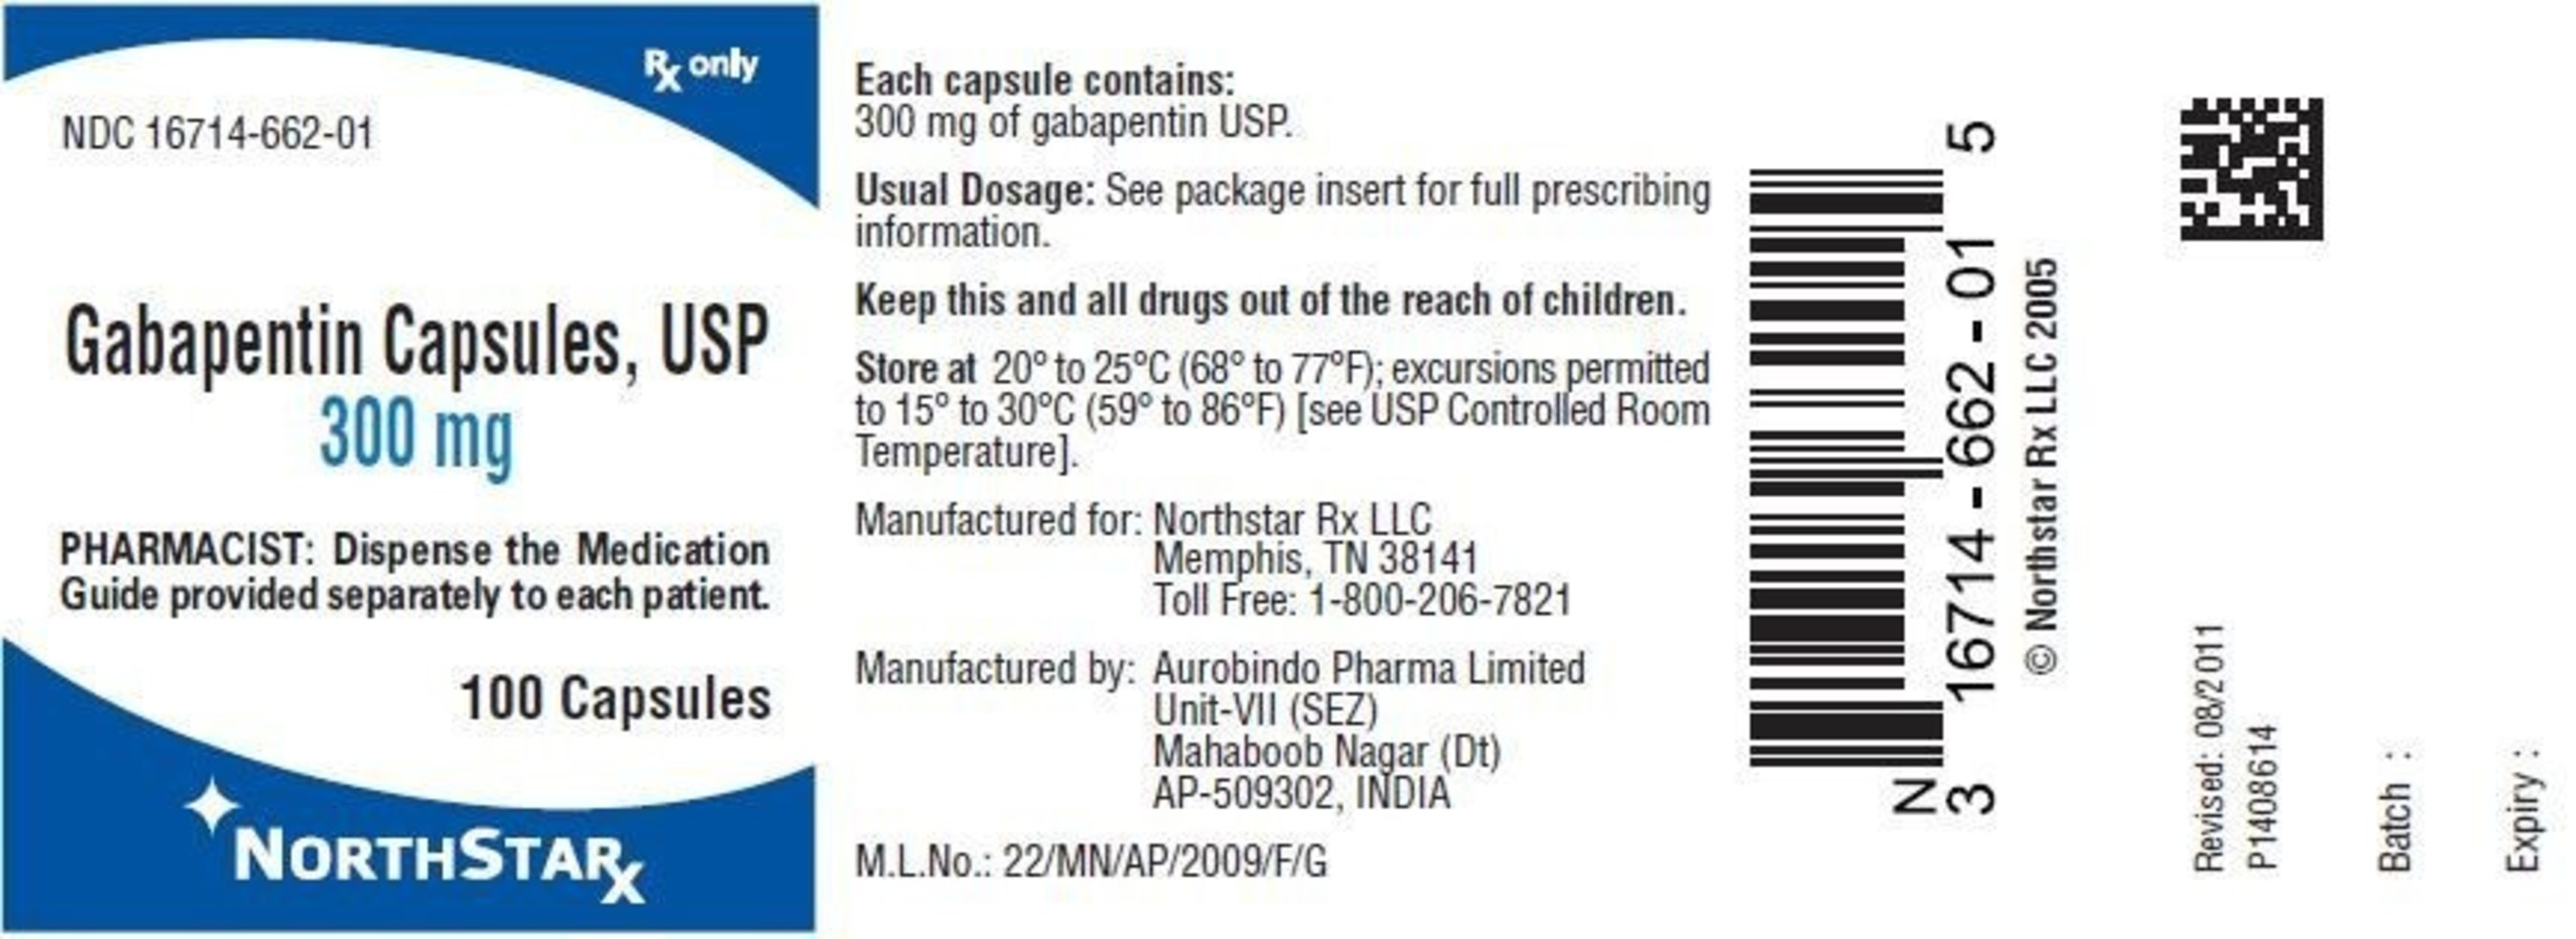 Gabapentin Capsules, USP 300 mg